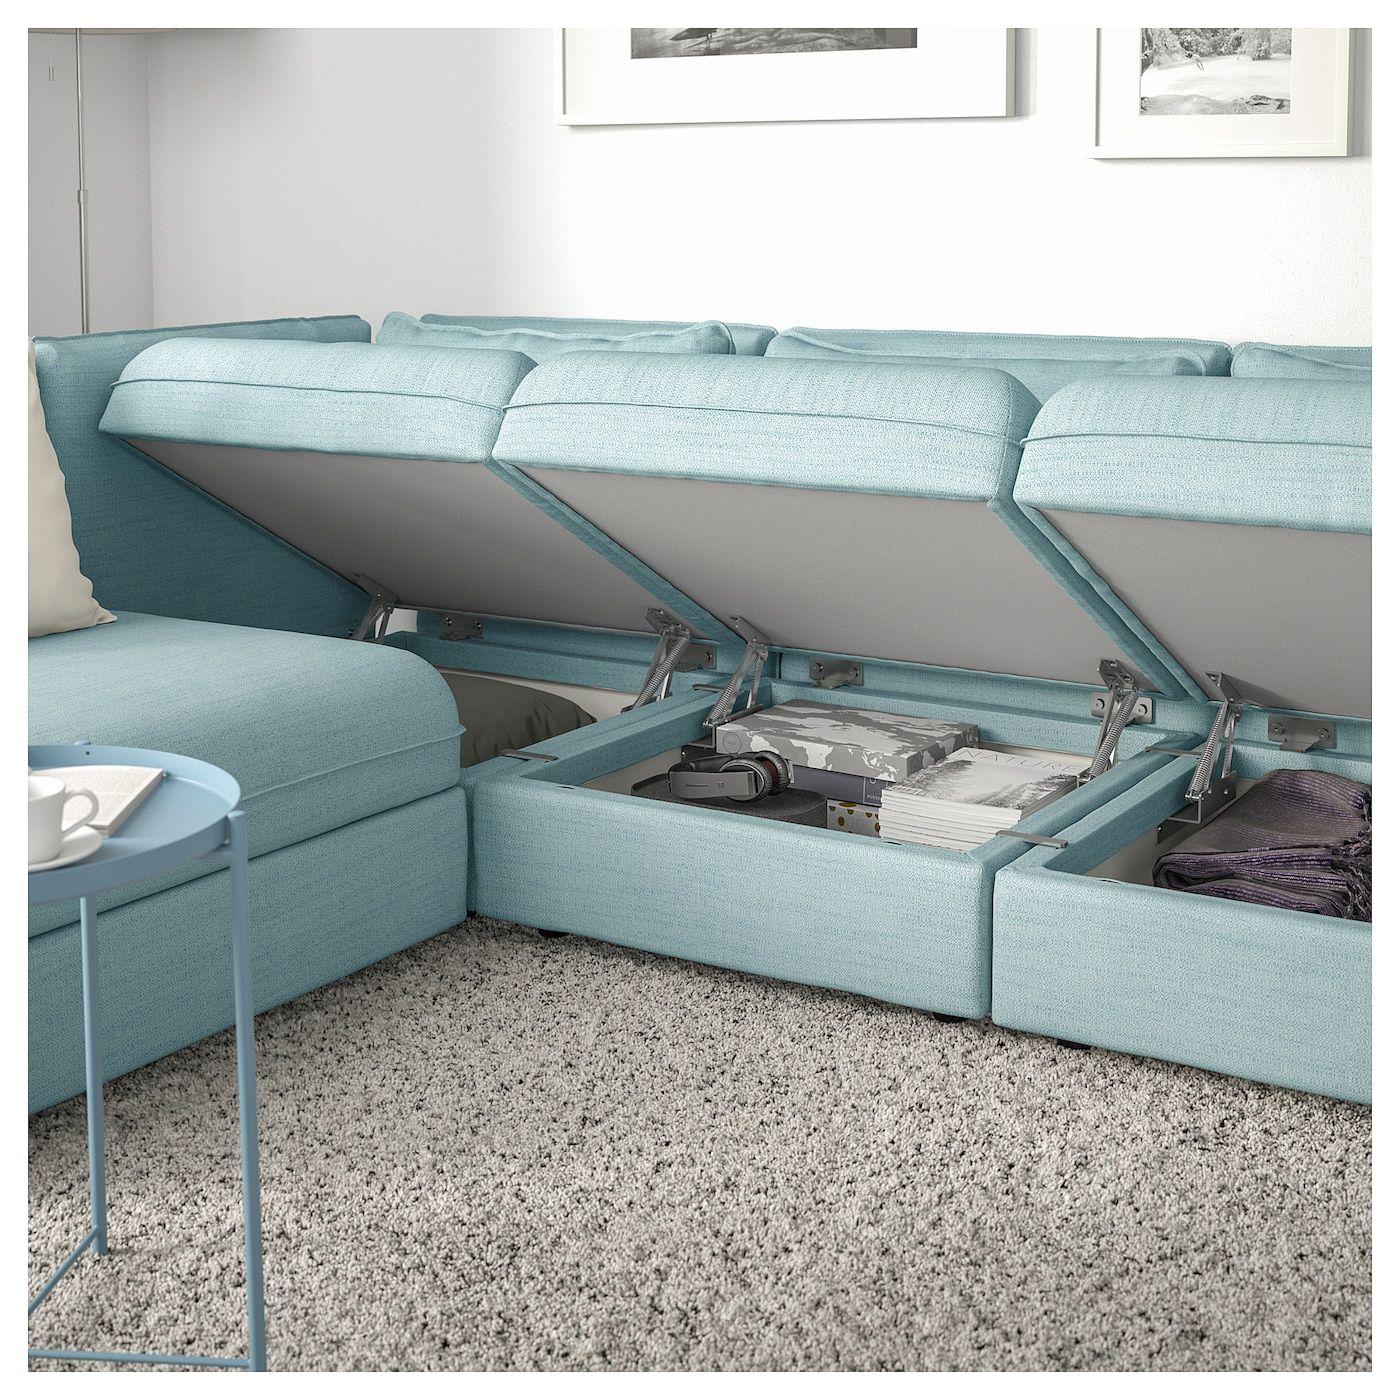 VALLENTUNA Modular corner sofa, 3-seat – with storage, Hillared light blue – IKEA